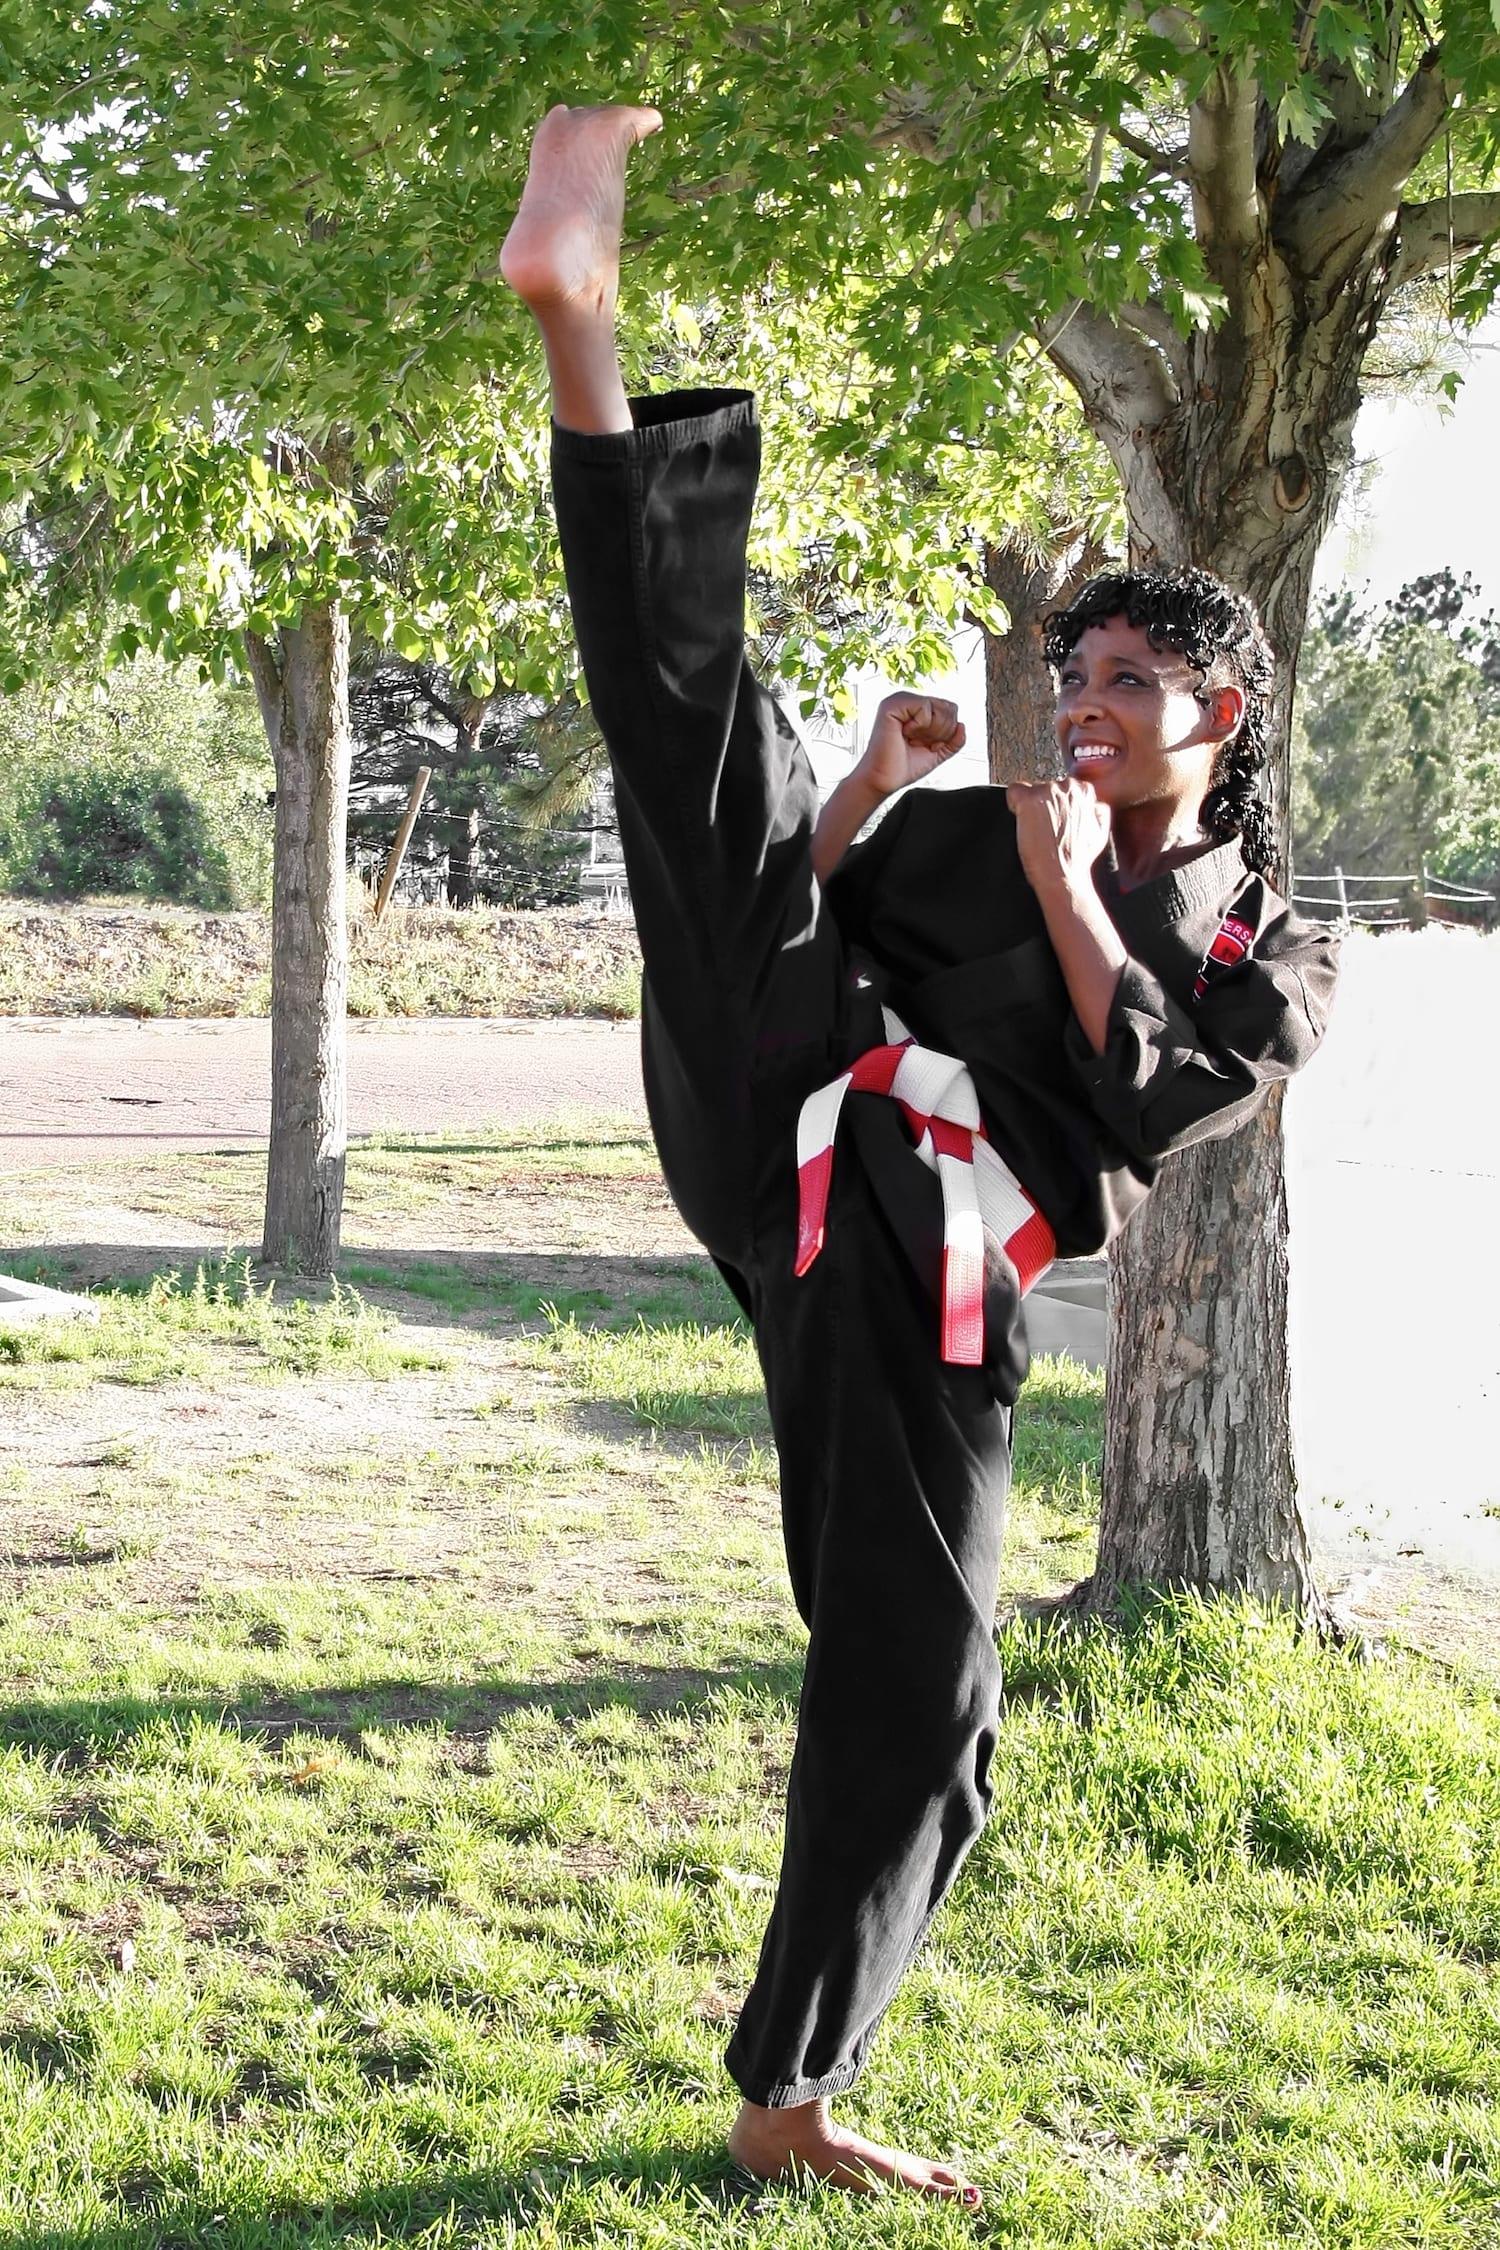 Bridget L. Johnson in Colorado Springs - Universal Kempo Karate